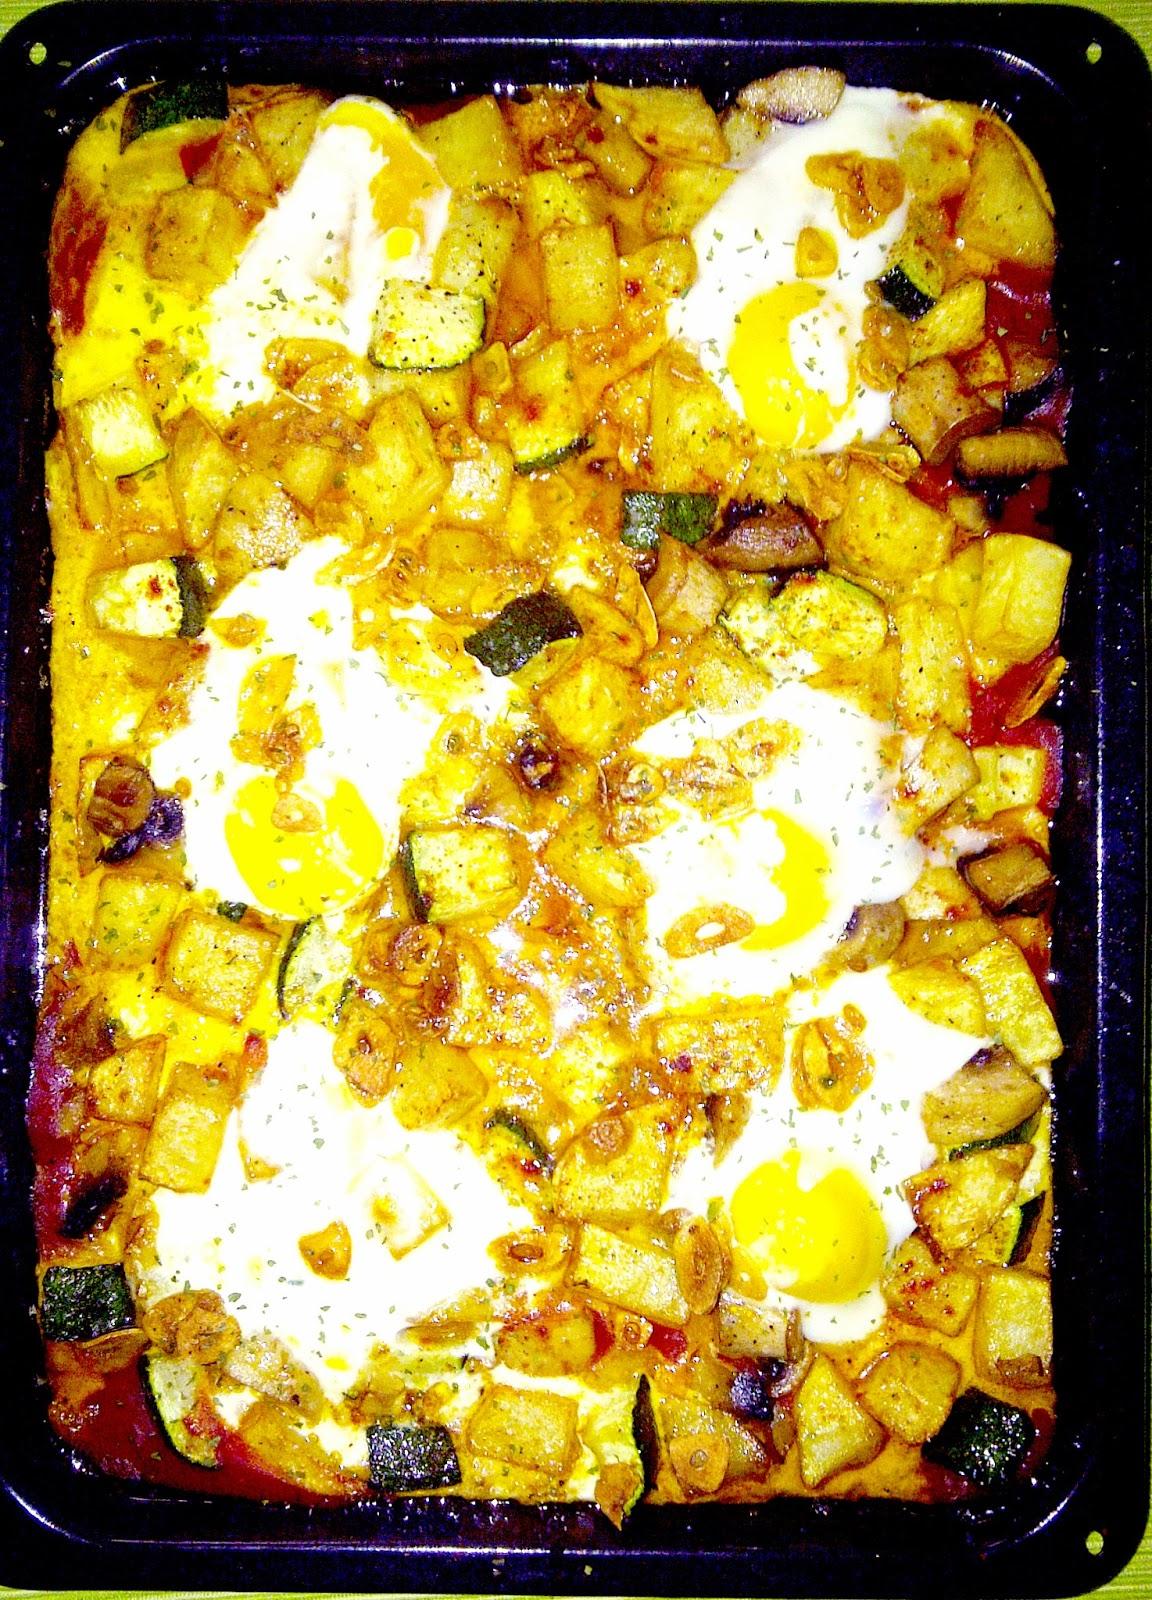 Huevos al plato a la andaluza